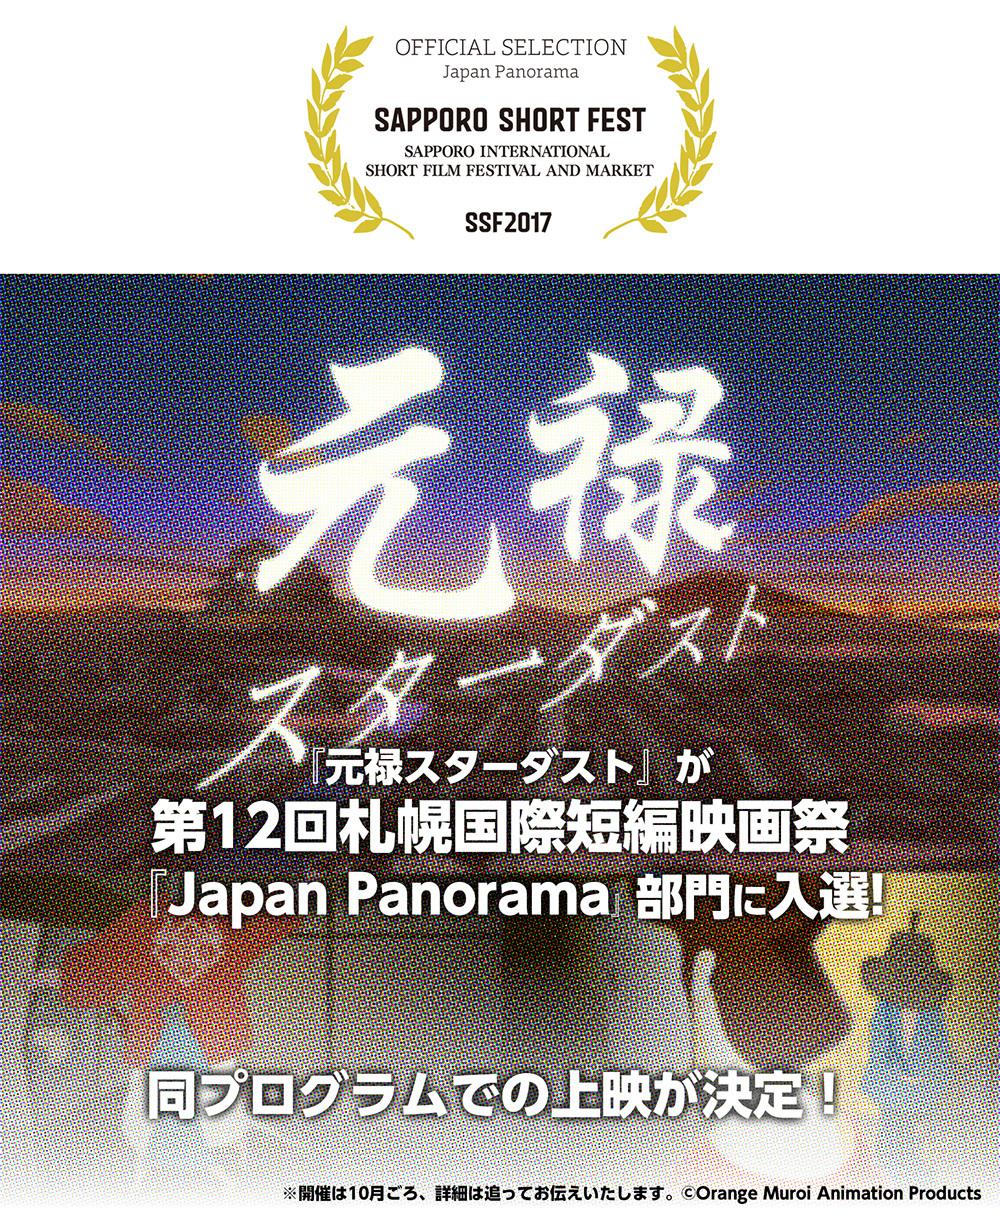 genroku_sapporo2.jpg